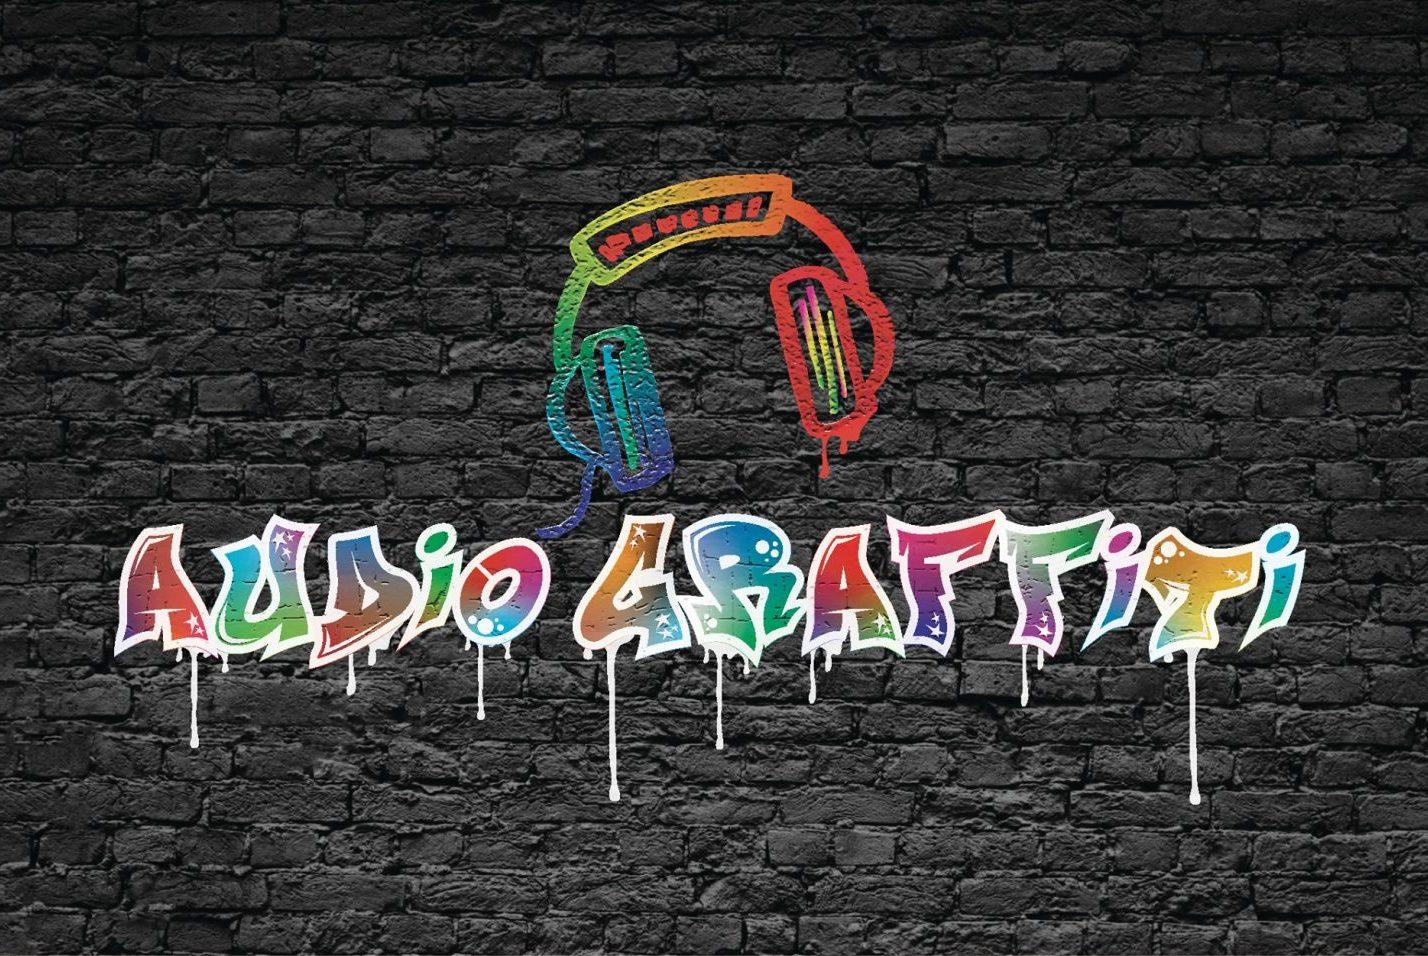 Audio Graffiti logo wall